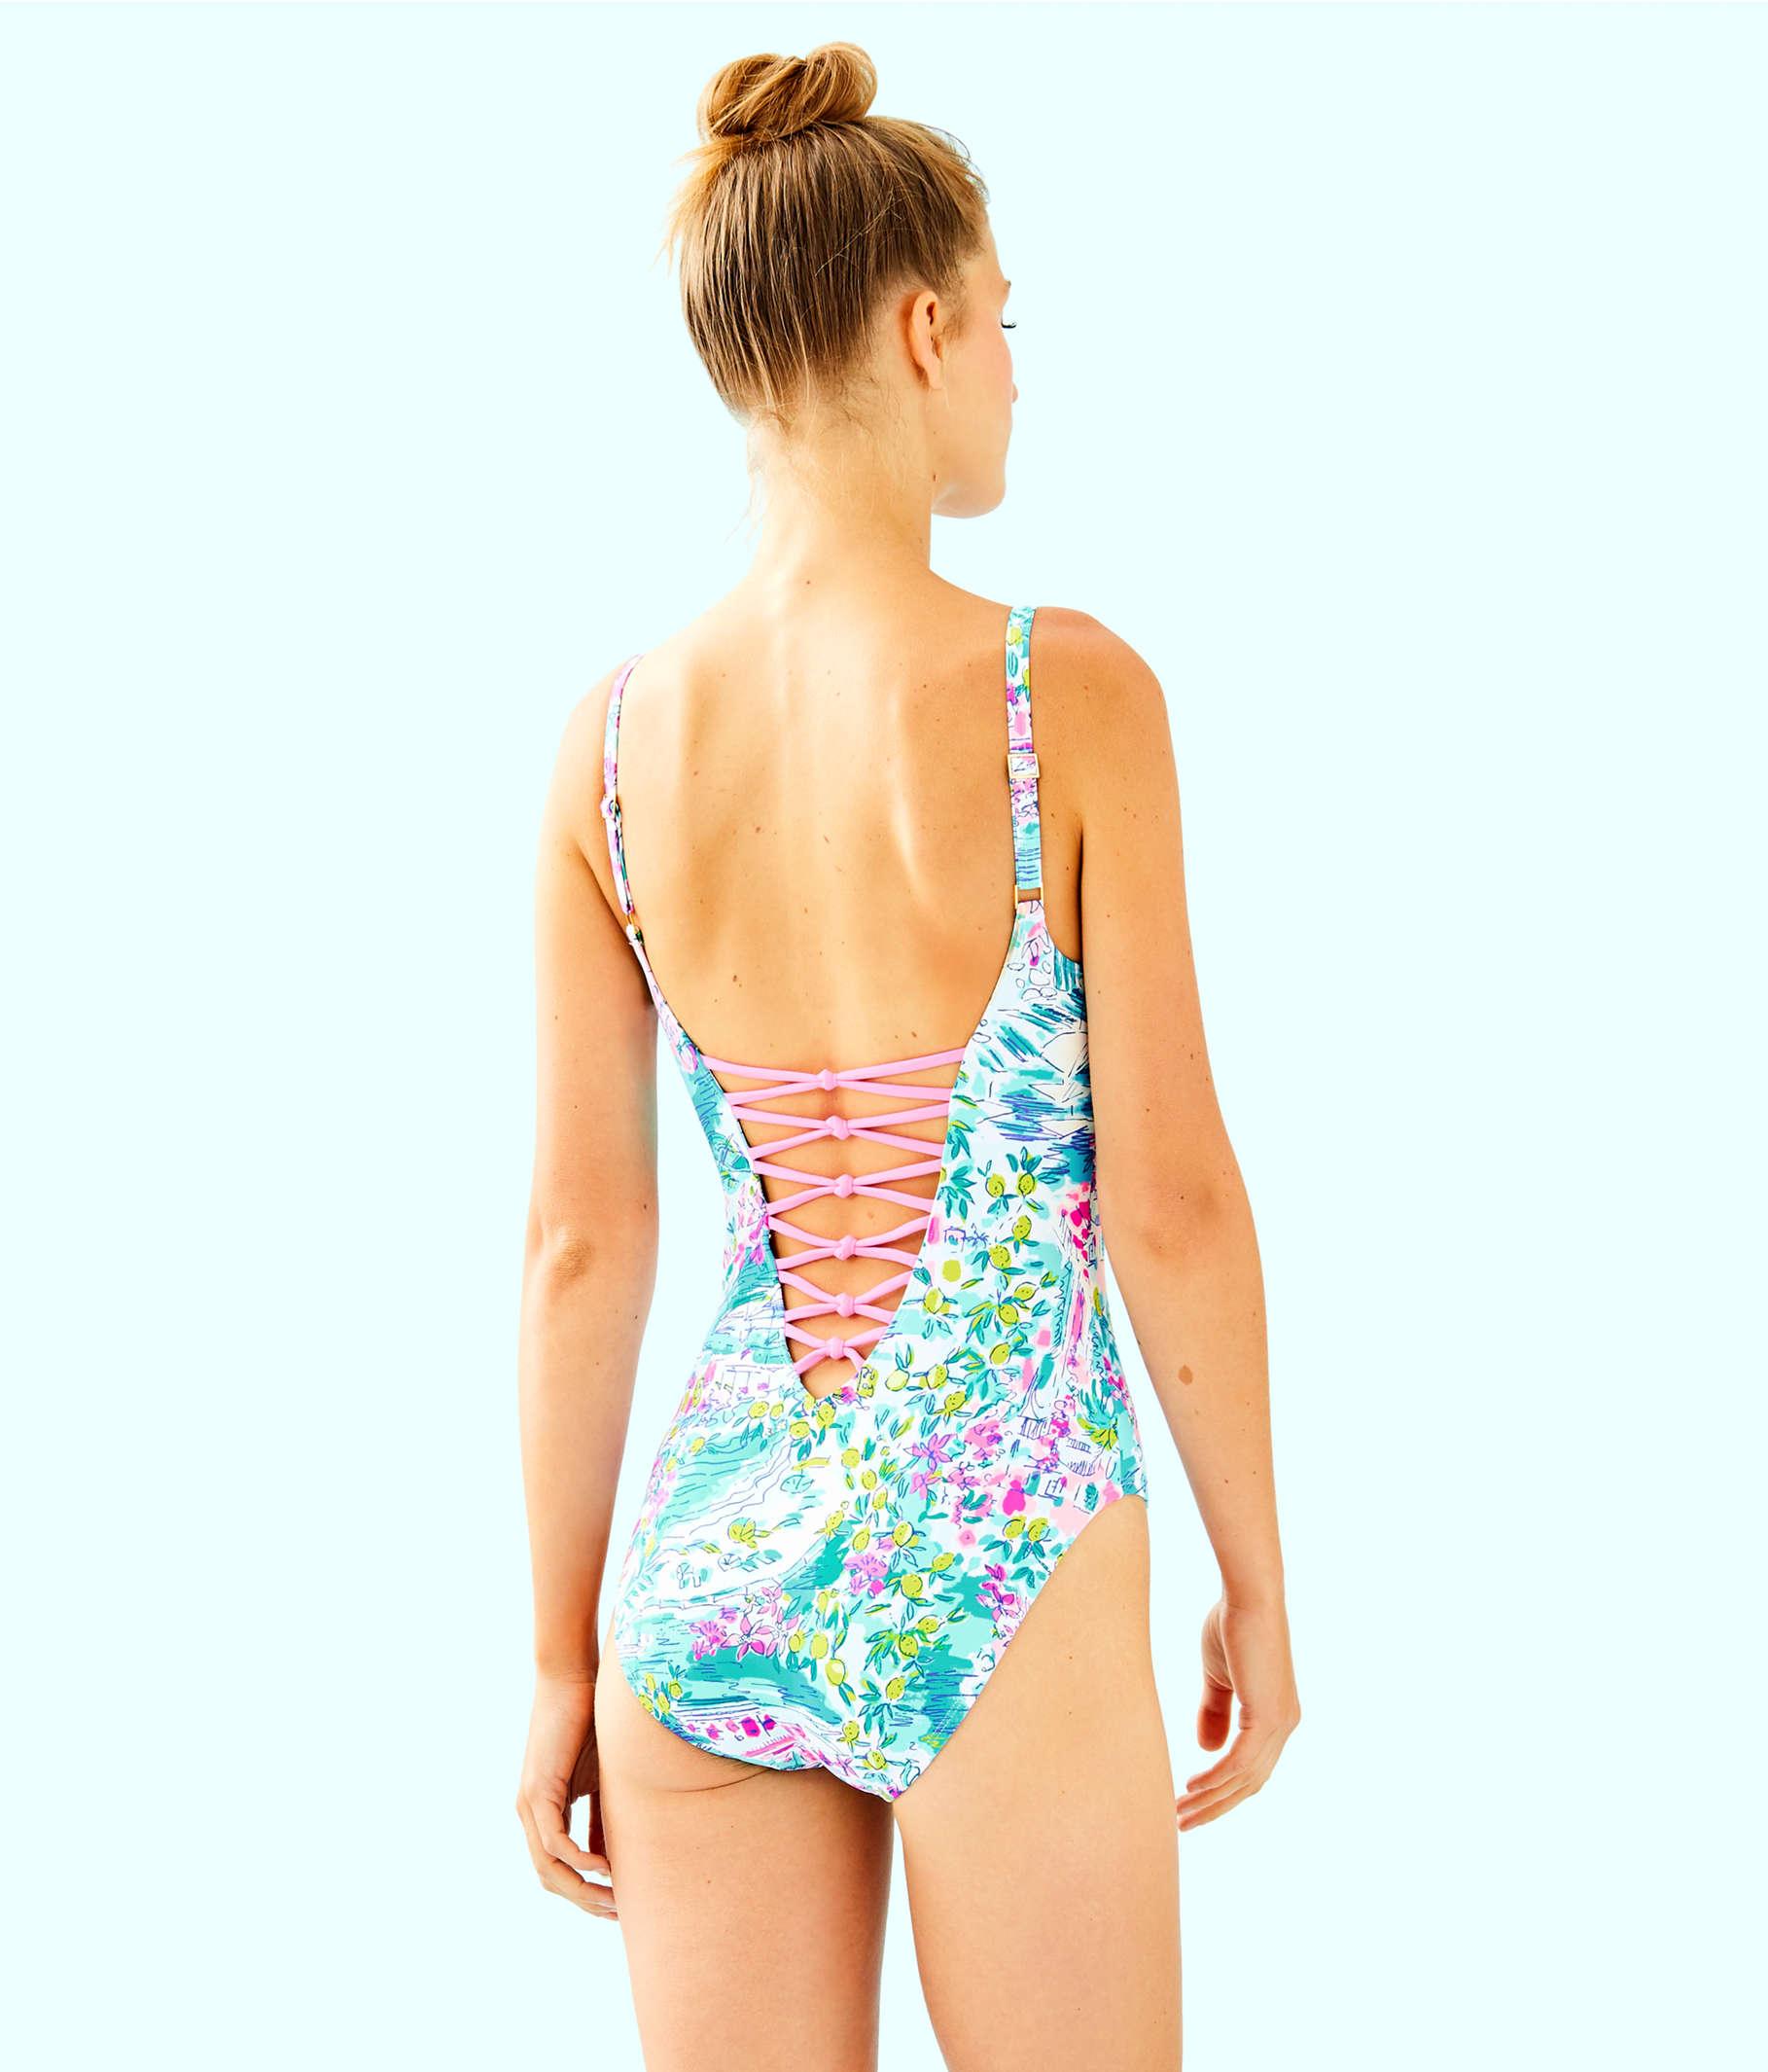 d95a56bd5d ... Isle Lattice One-Piece Swimsuit, Multi Postcards From Positano, large  ...